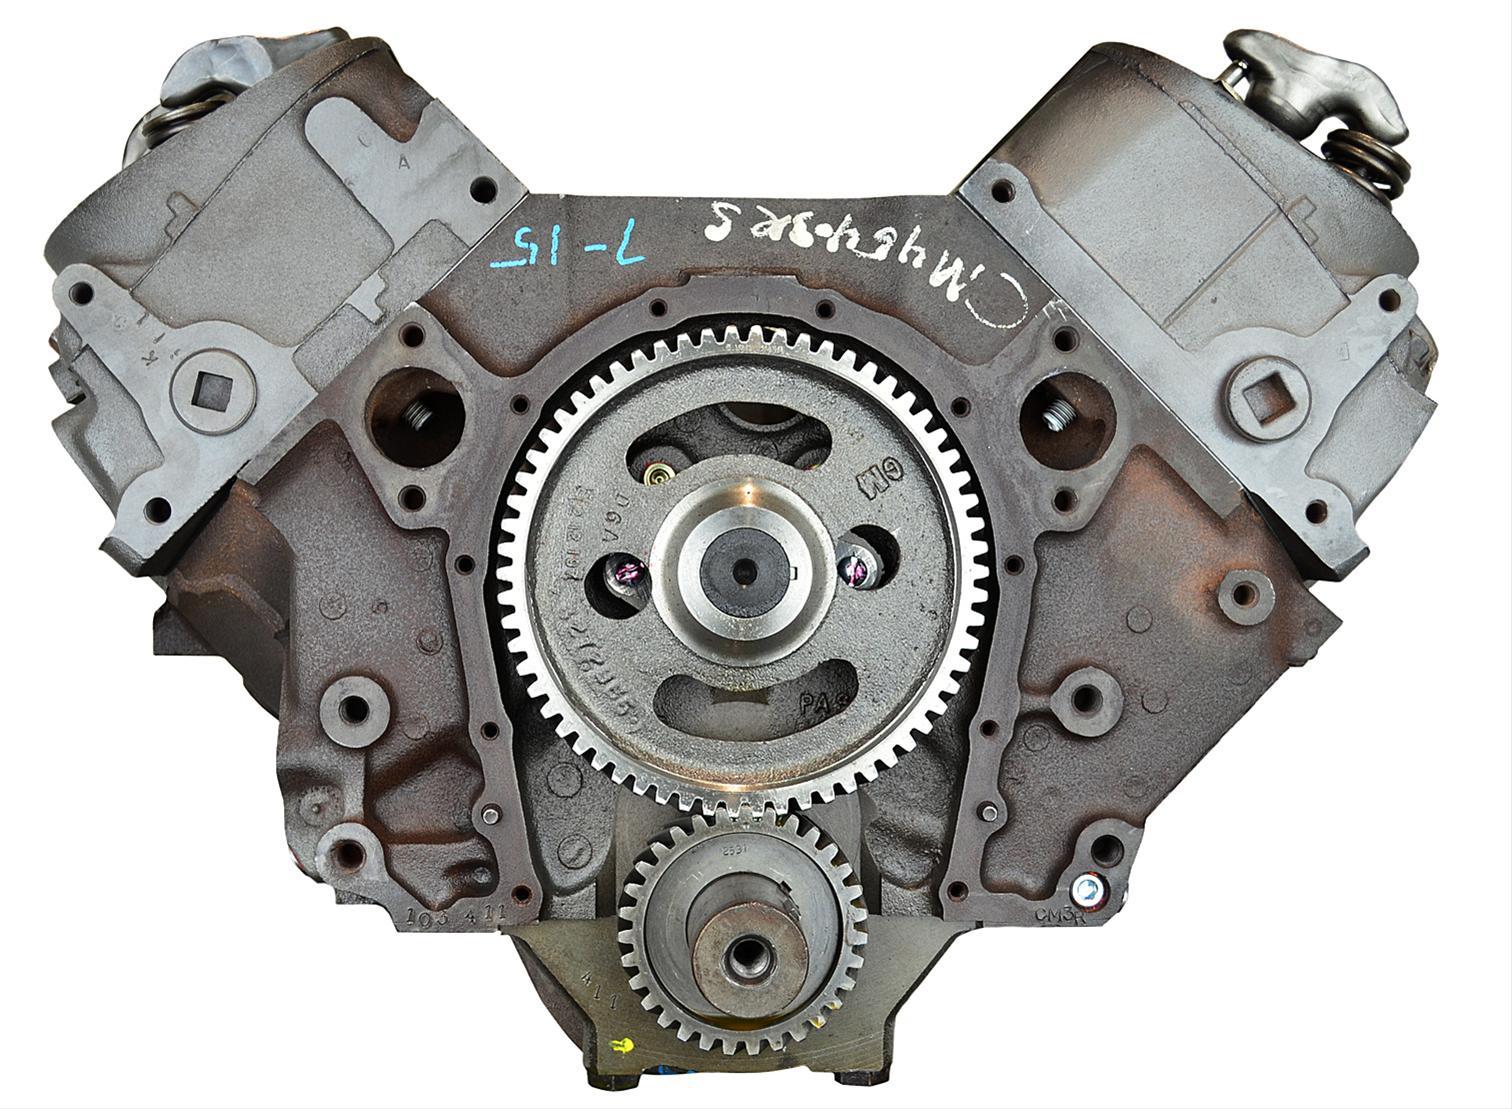 New Remanufactured Rebuilt Marine Engines Atk Marine